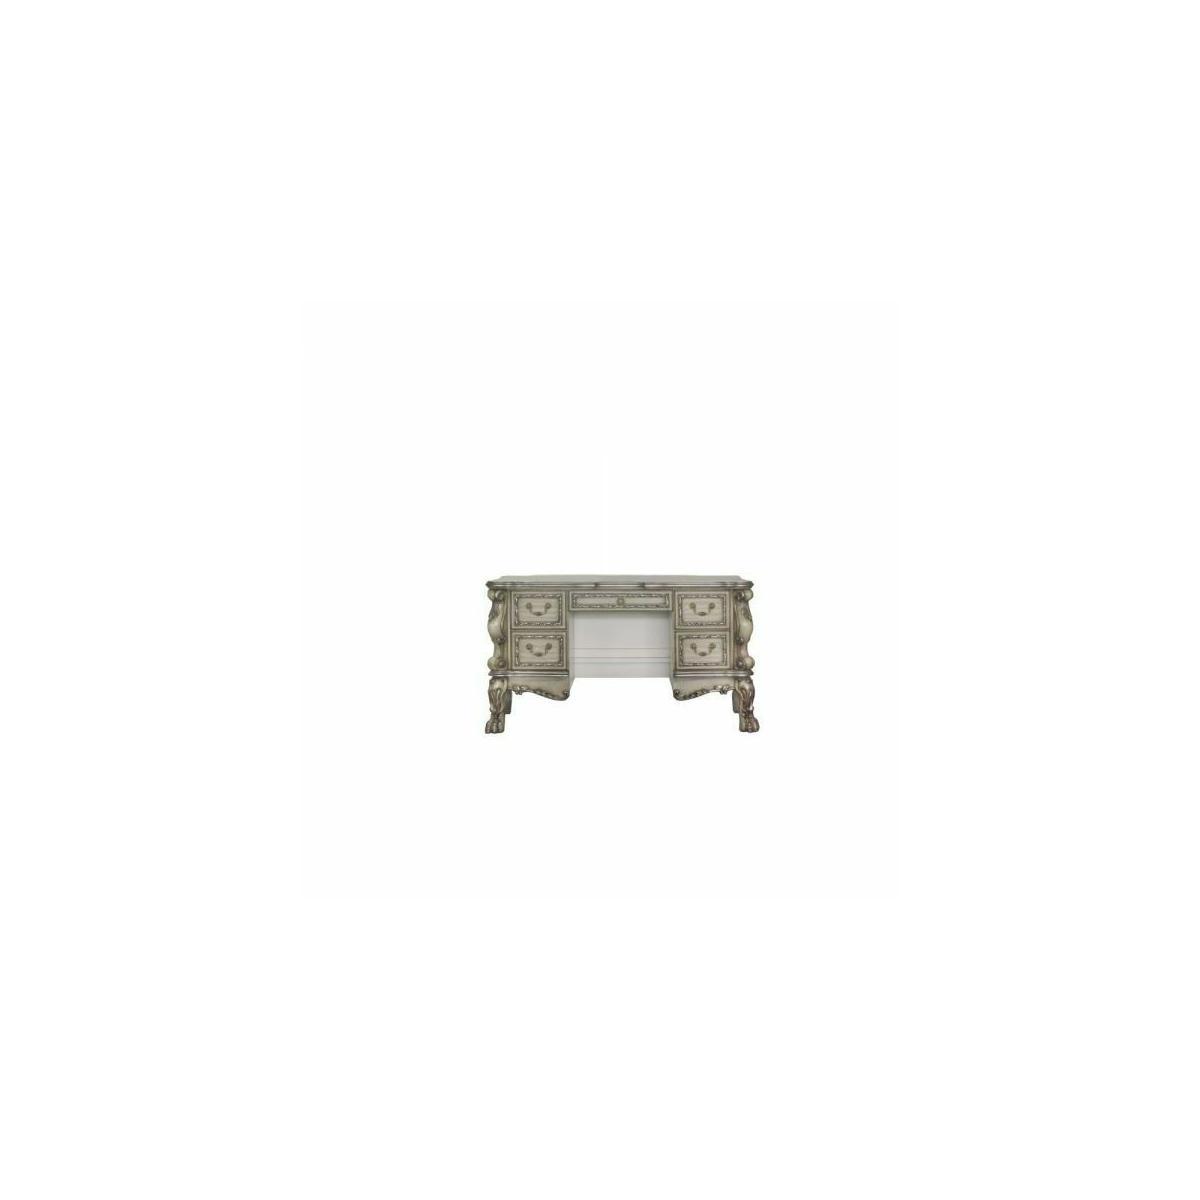 ACME Dresden Vanity Desk - 28193 - Traditional, Vintage - Wood (Poplar), MDF, Poly-Resin - Vintage Bone White